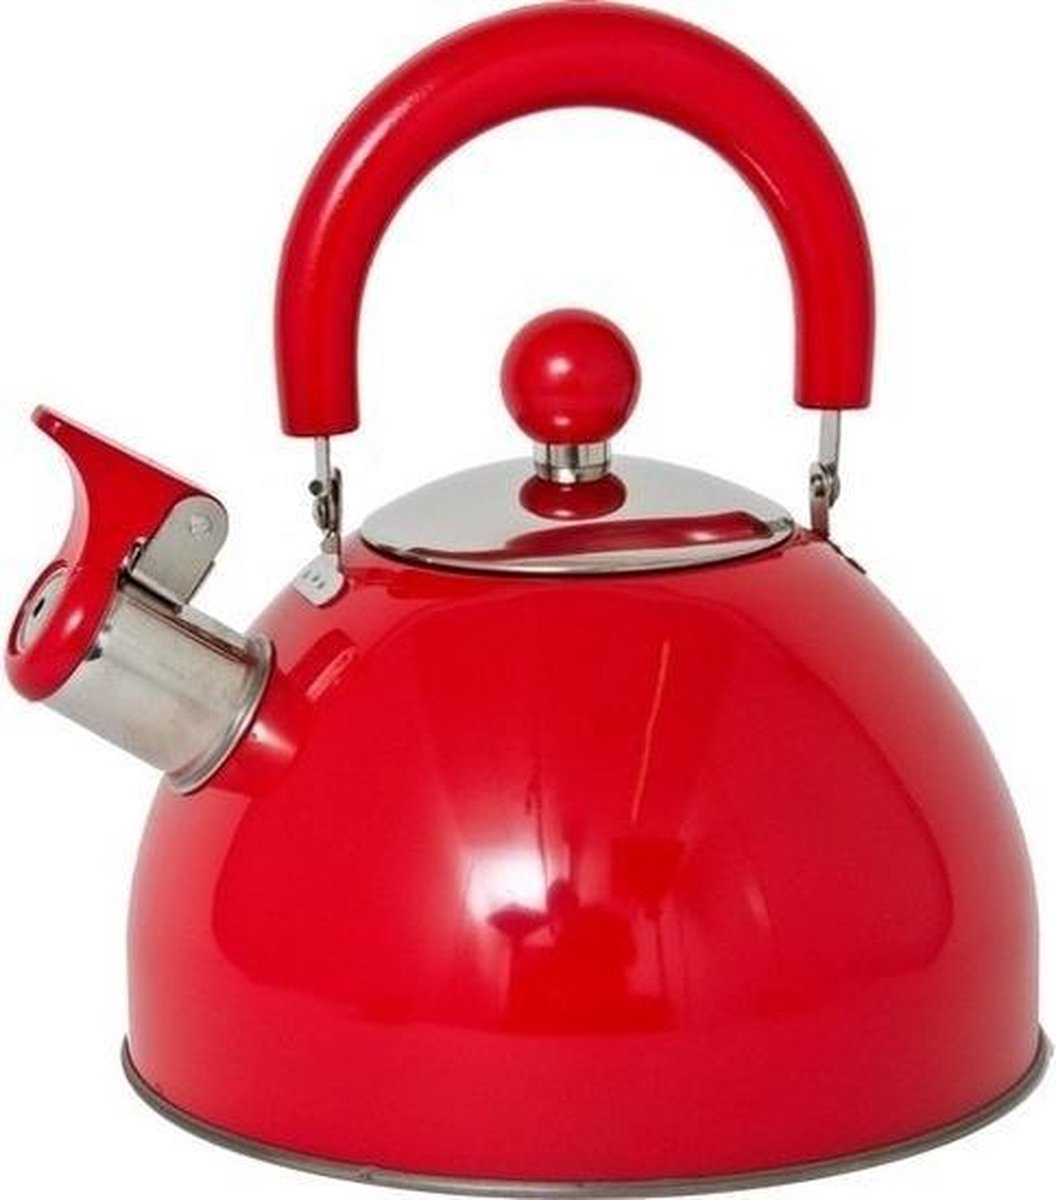 | Rode fluitketelwaterkoker RVS 2,5 liter